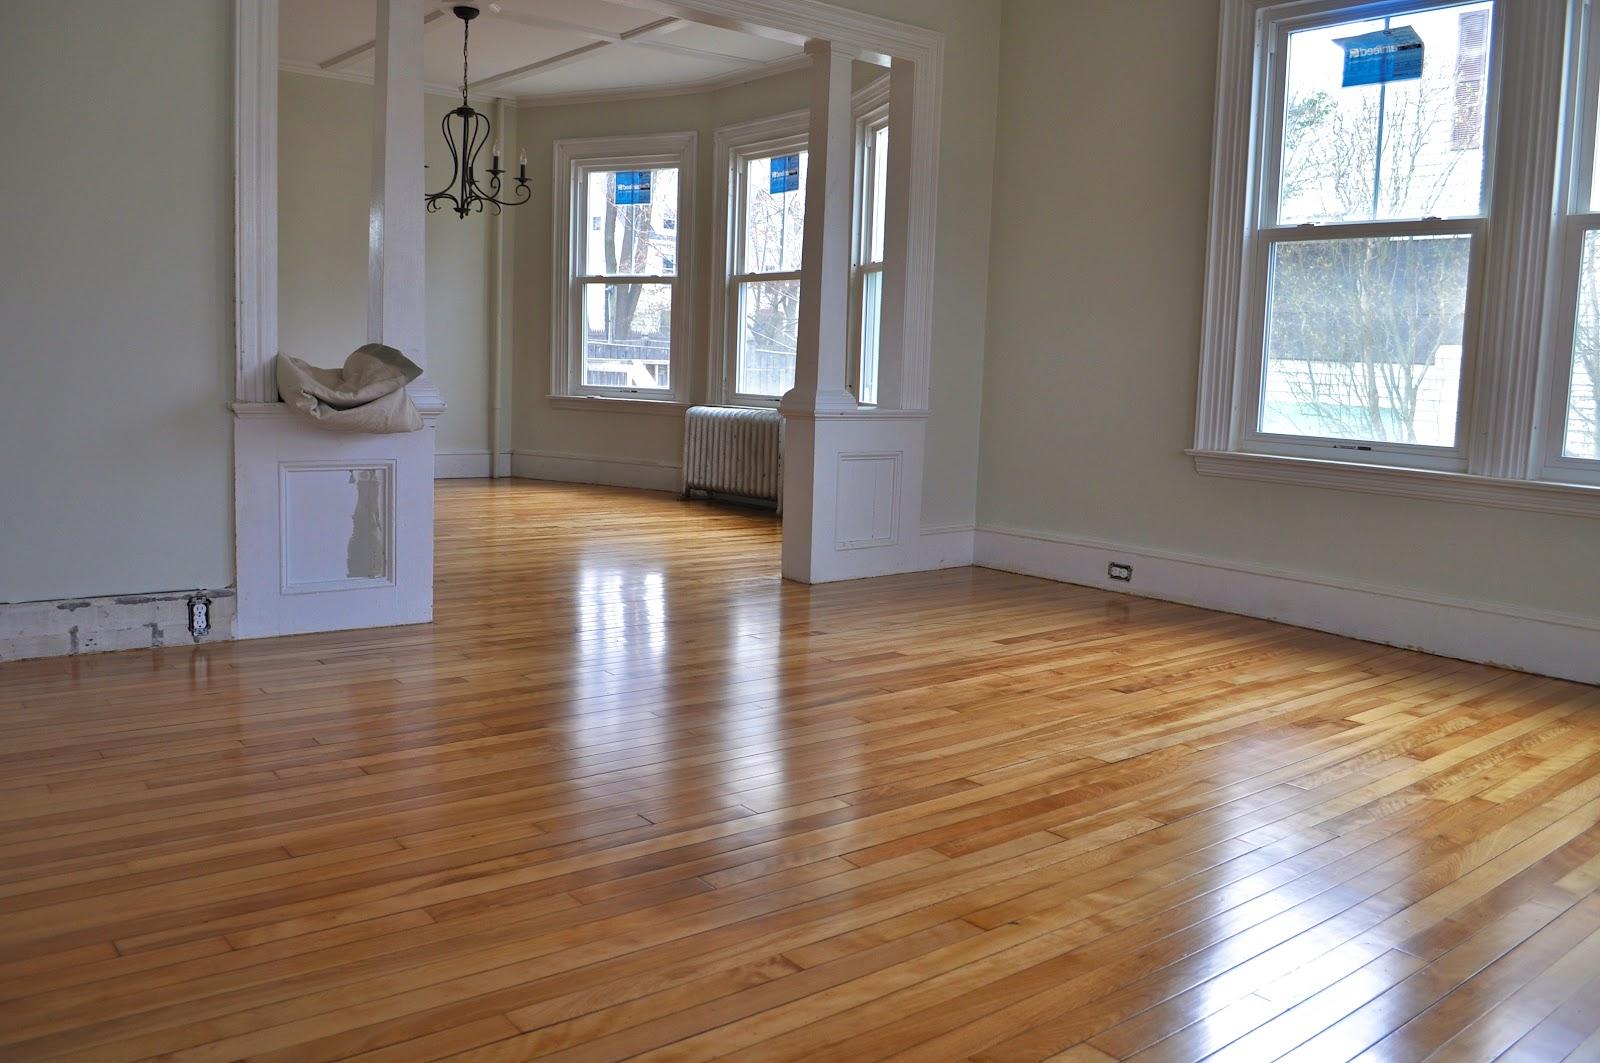 Sopo cottage from shabby to shiny floor refinishing for Hardwood floors not shiny